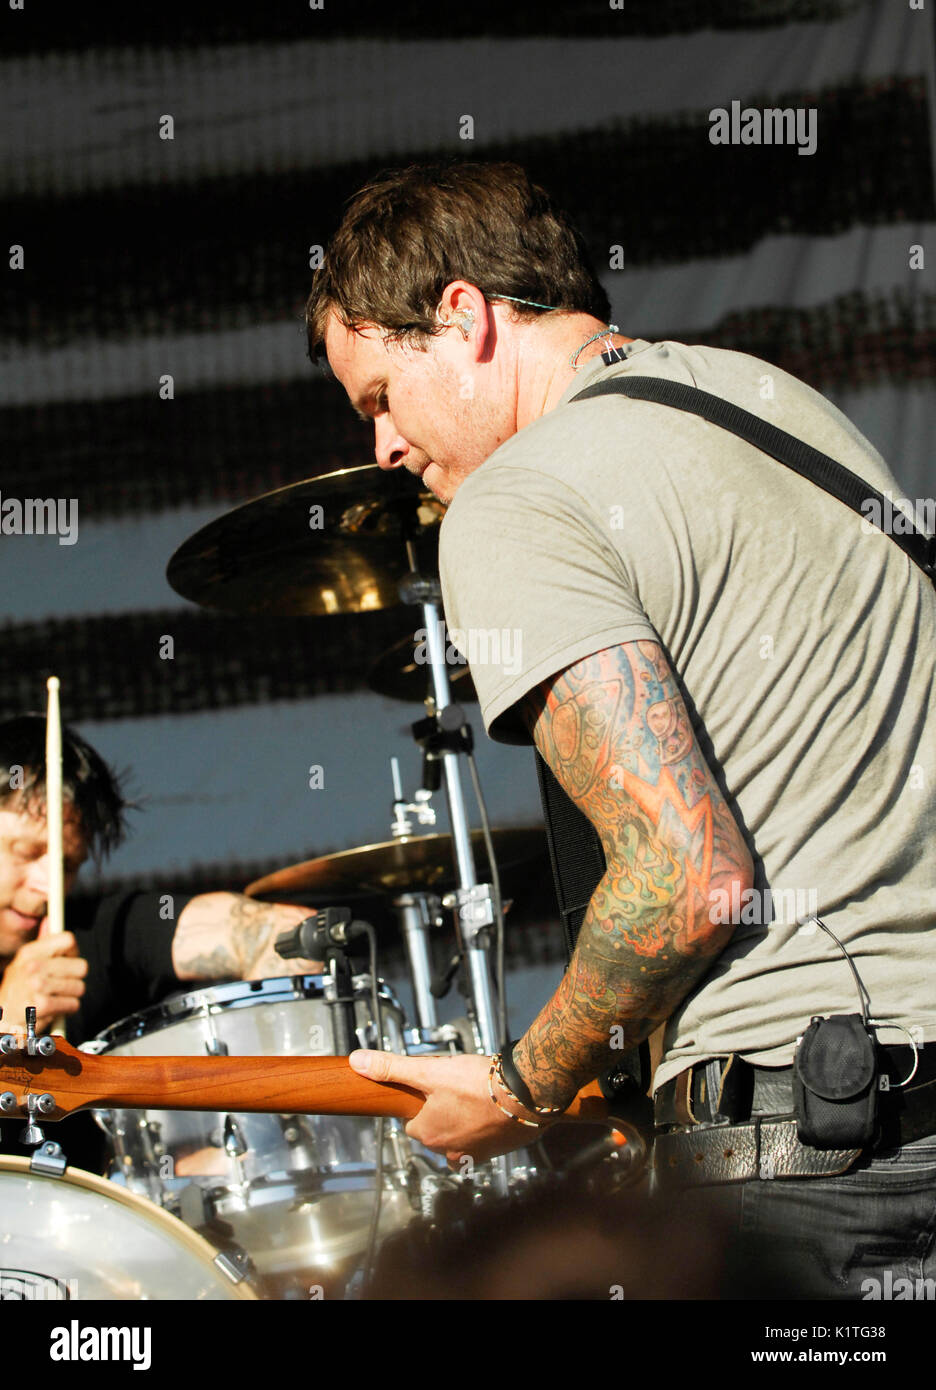 Tom DeLonge Angels Airwaves performing 2008 Vans Warped Tour Pomona Fairgrounds Pomona. - Stock Image